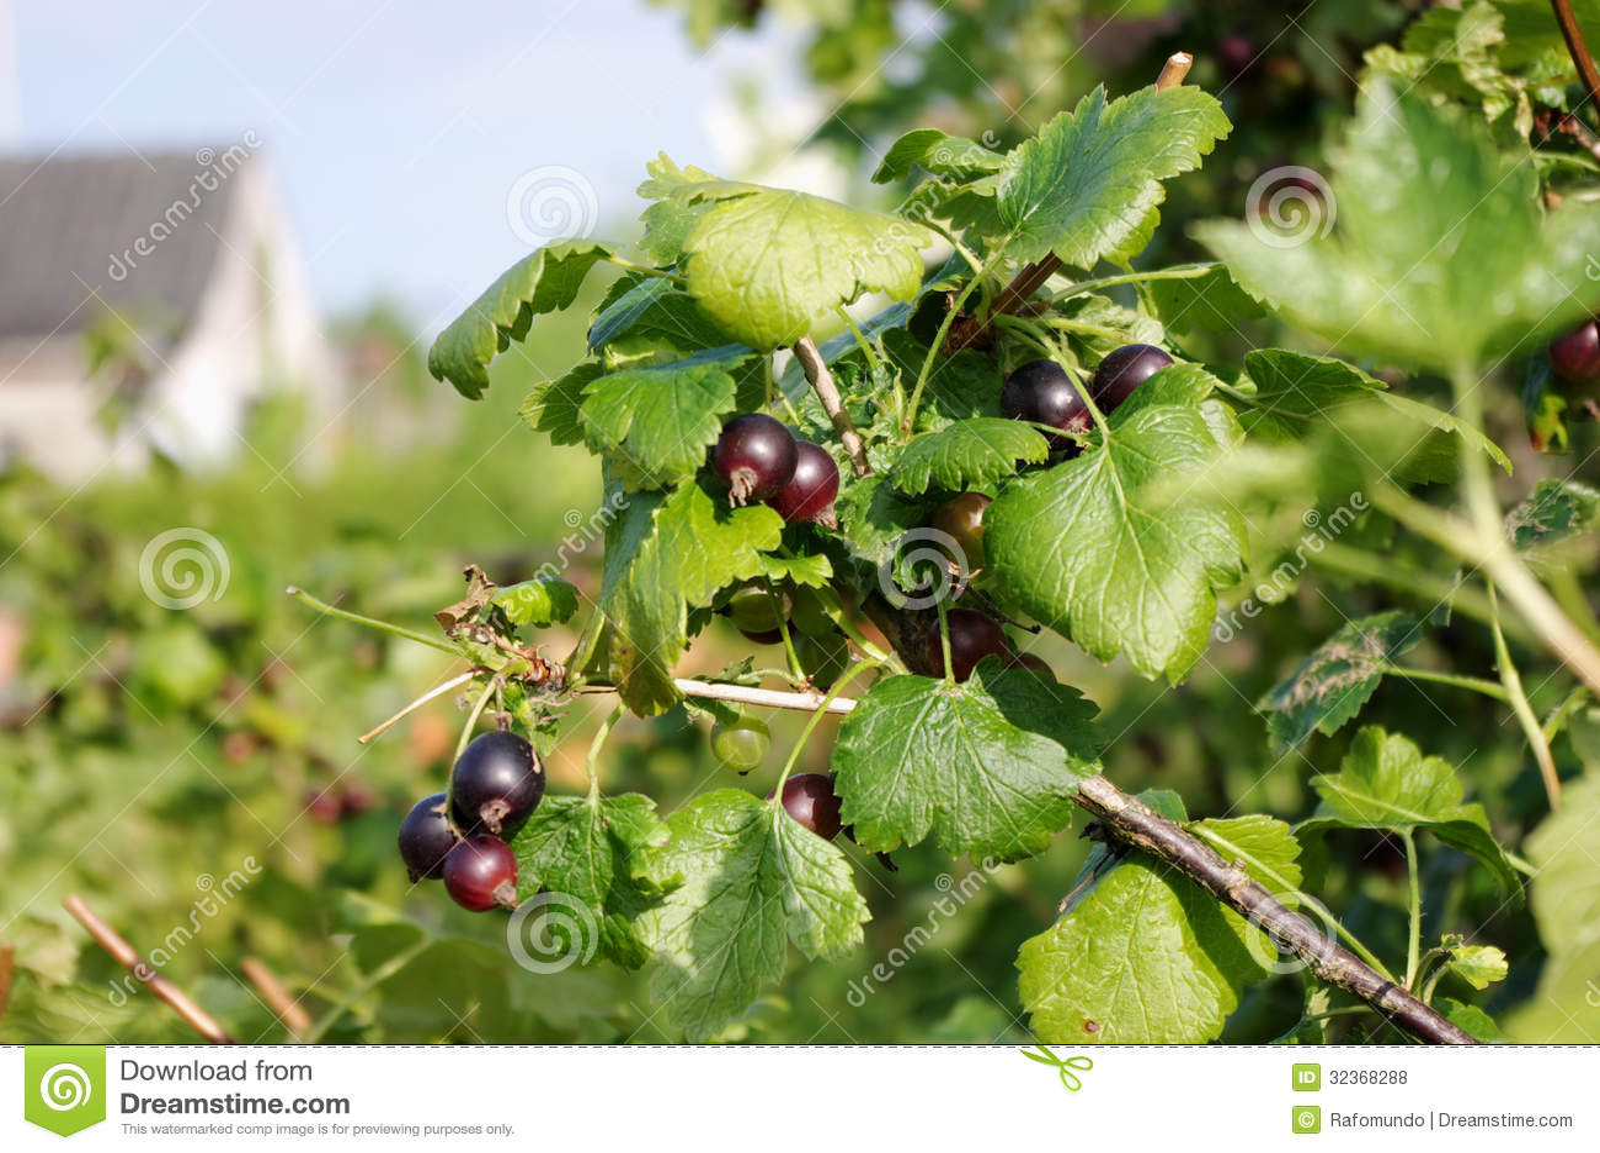 Buy Blackcurrant Bush